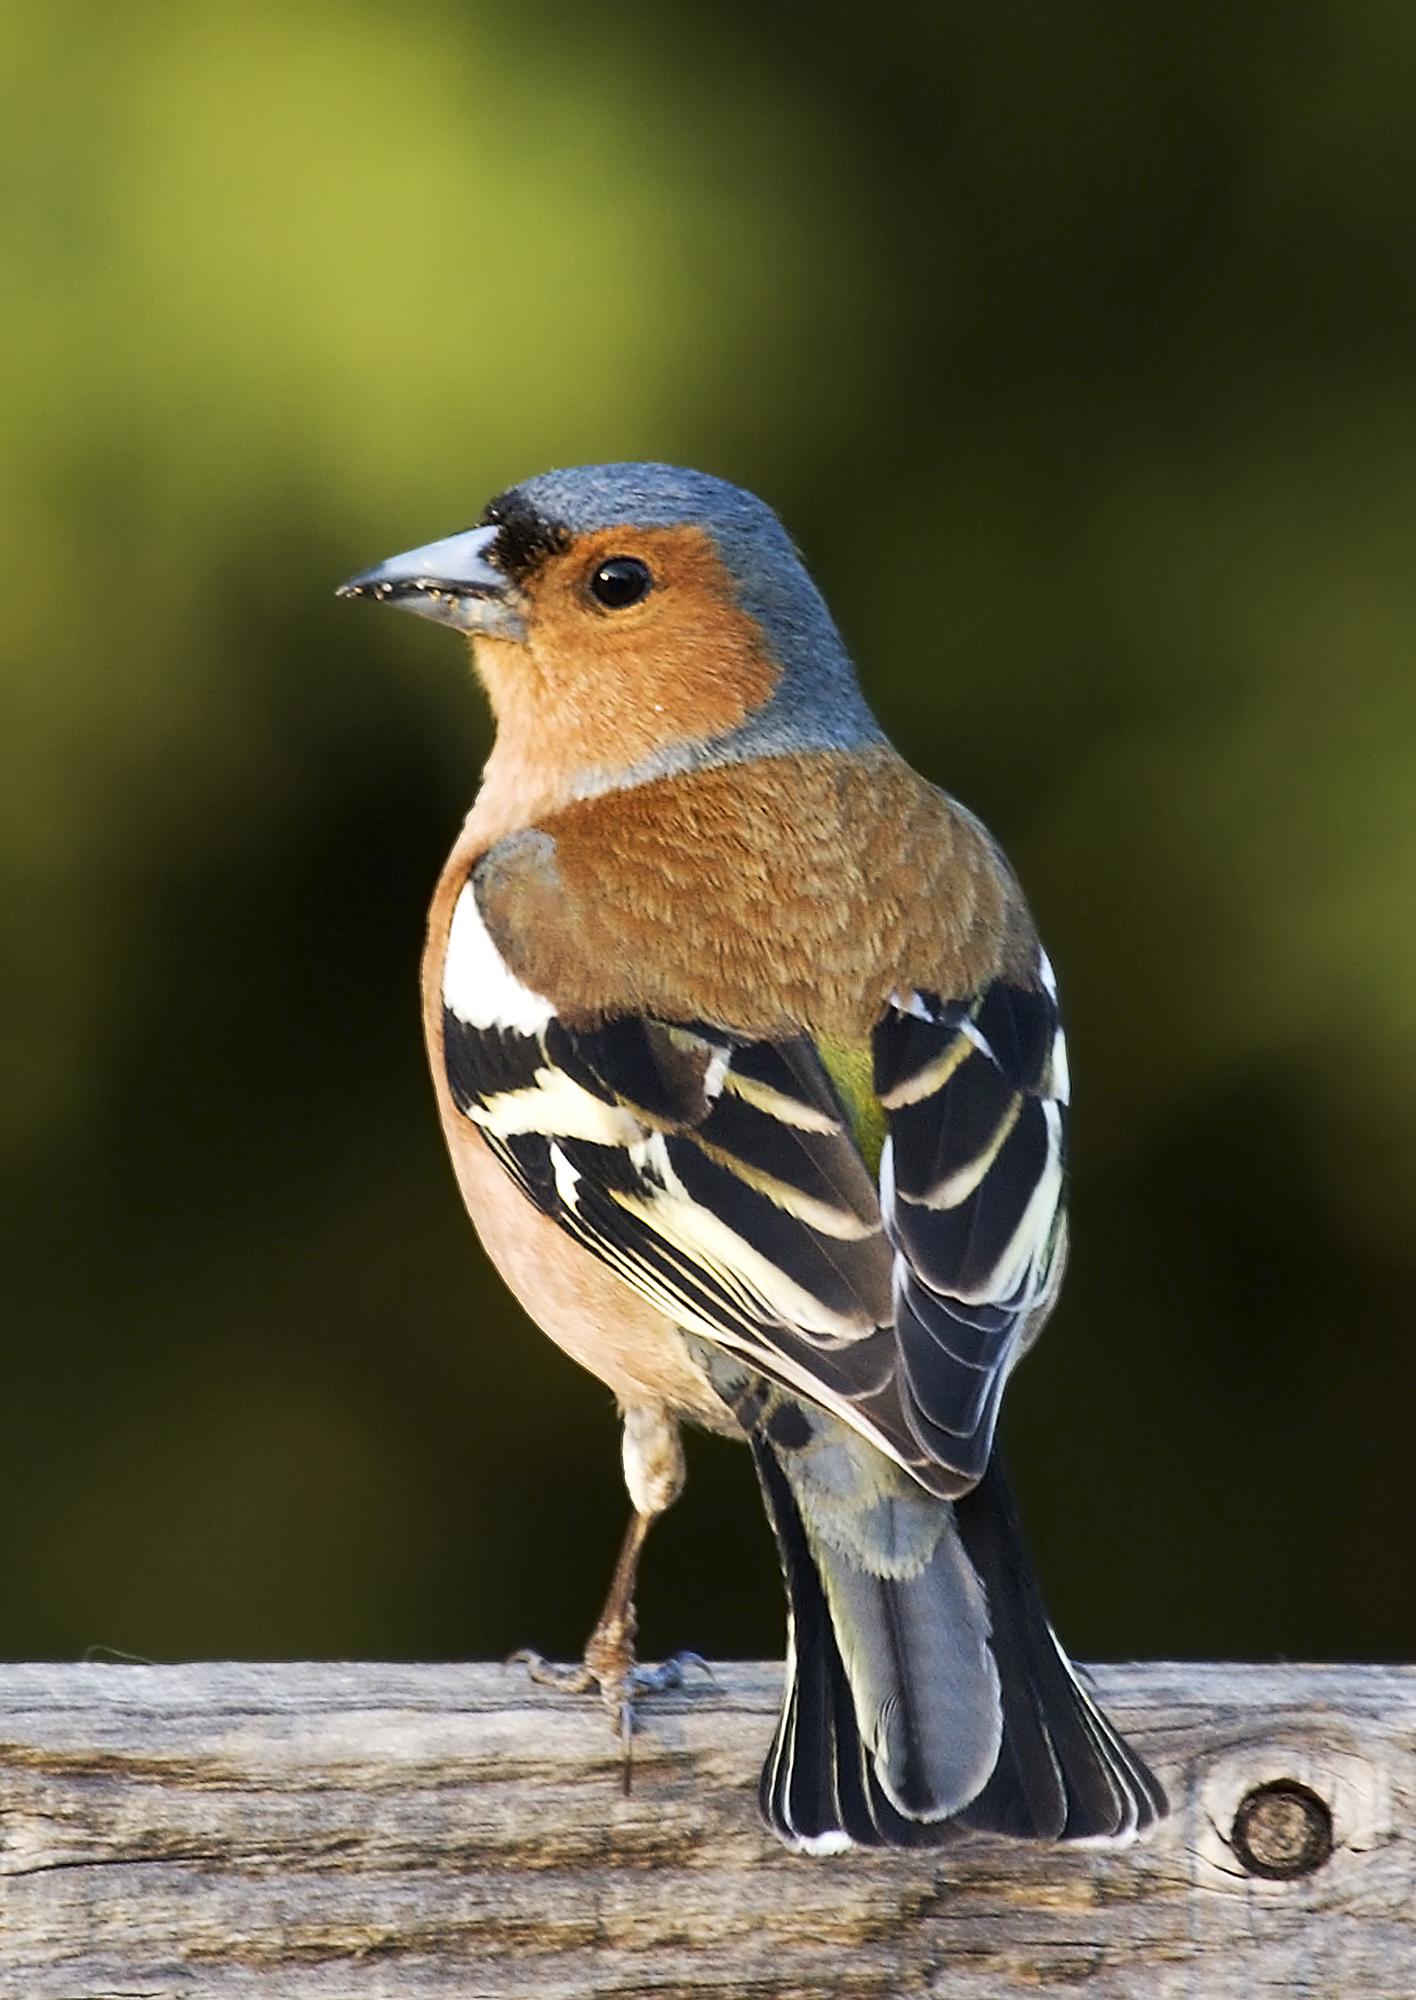 Depiction of Passeriformes